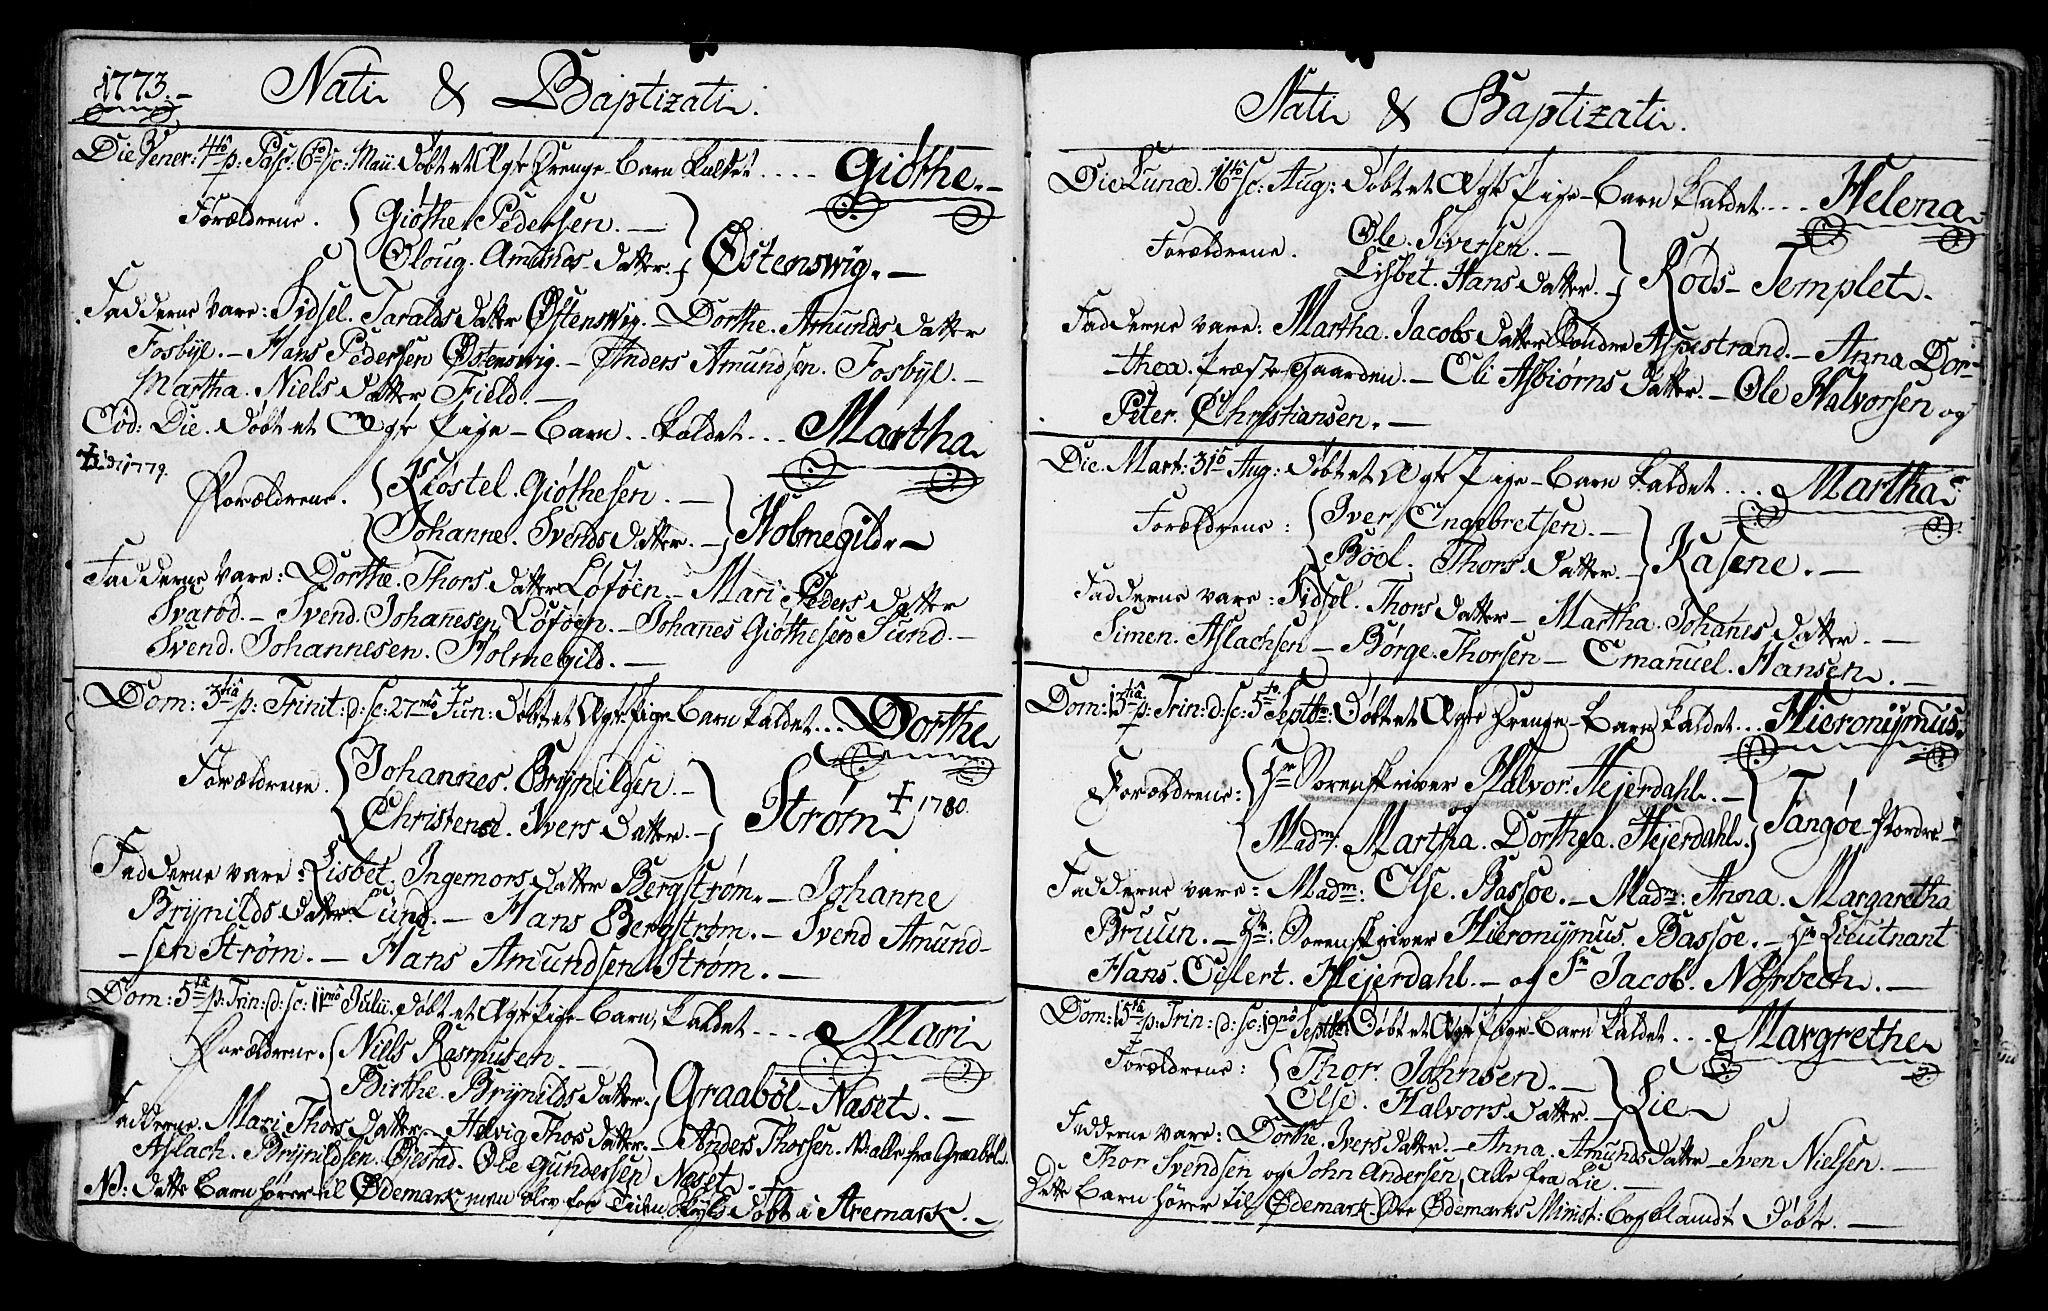 SAO, Aremark prestekontor Kirkebøker, F/Fa/L0002: Ministerialbok nr. I 2, 1745-1795